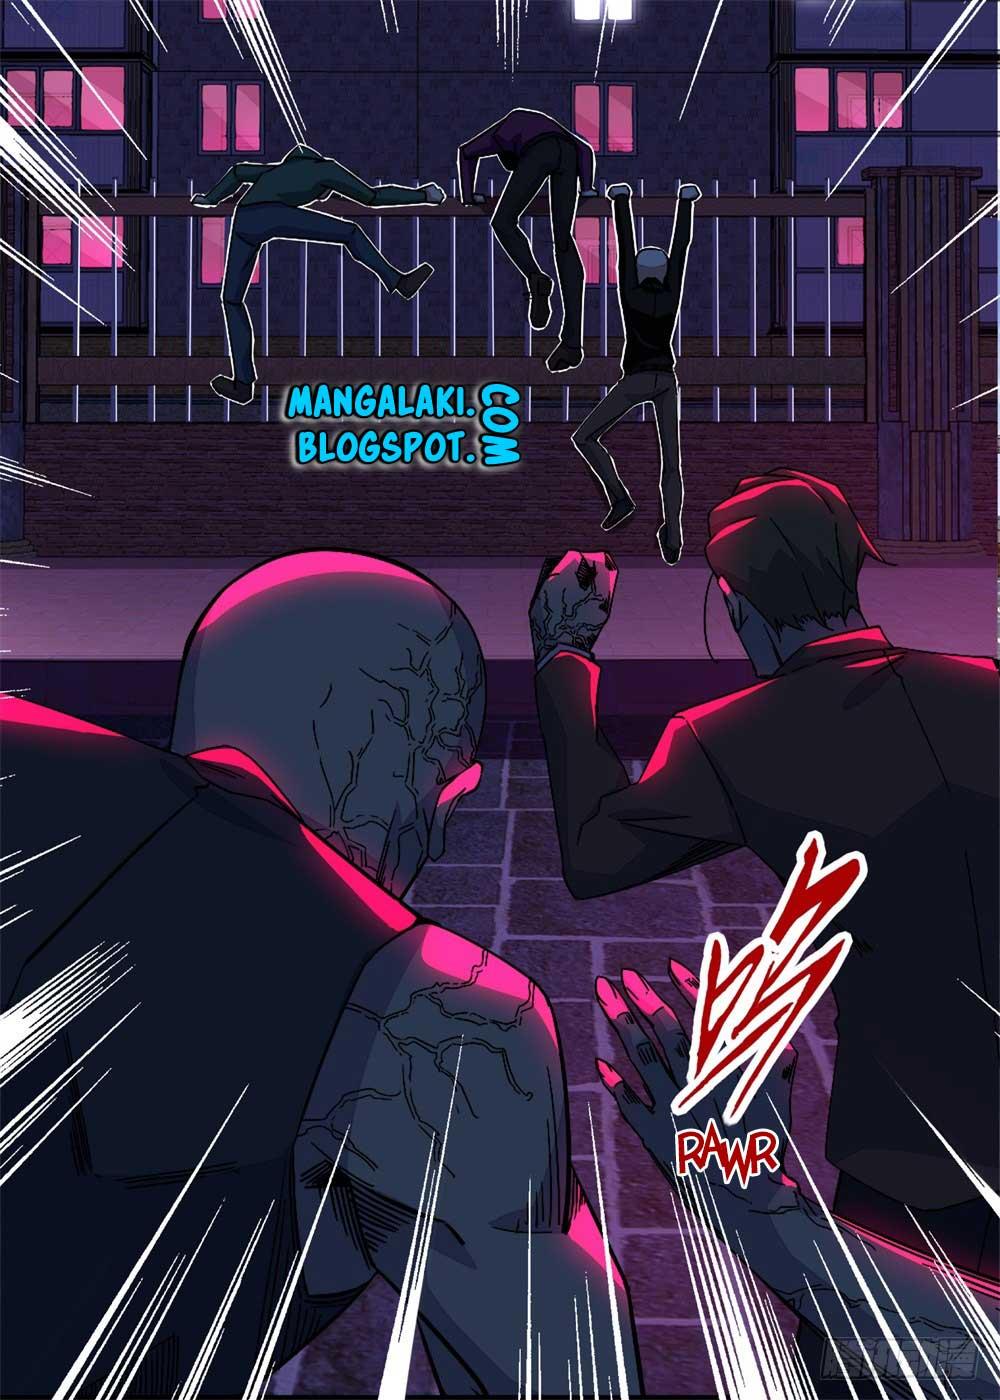 Dilarang COPAS - situs resmi www.mangacanblog.com - Komik king of apocalypse 013 - chapter 13 14 Indonesia king of apocalypse 013 - chapter 13 Terbaru 5|Baca Manga Komik Indonesia|Mangacan